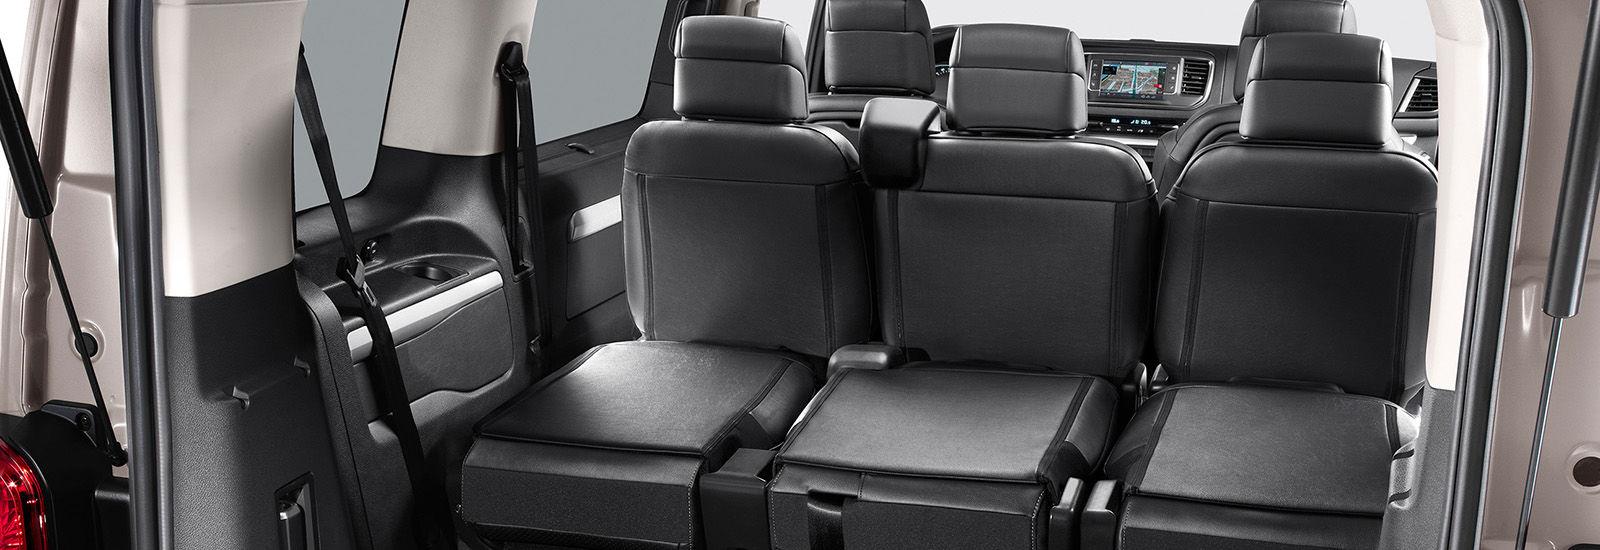 citroen spacetourer price specs release date carwow. Black Bedroom Furniture Sets. Home Design Ideas